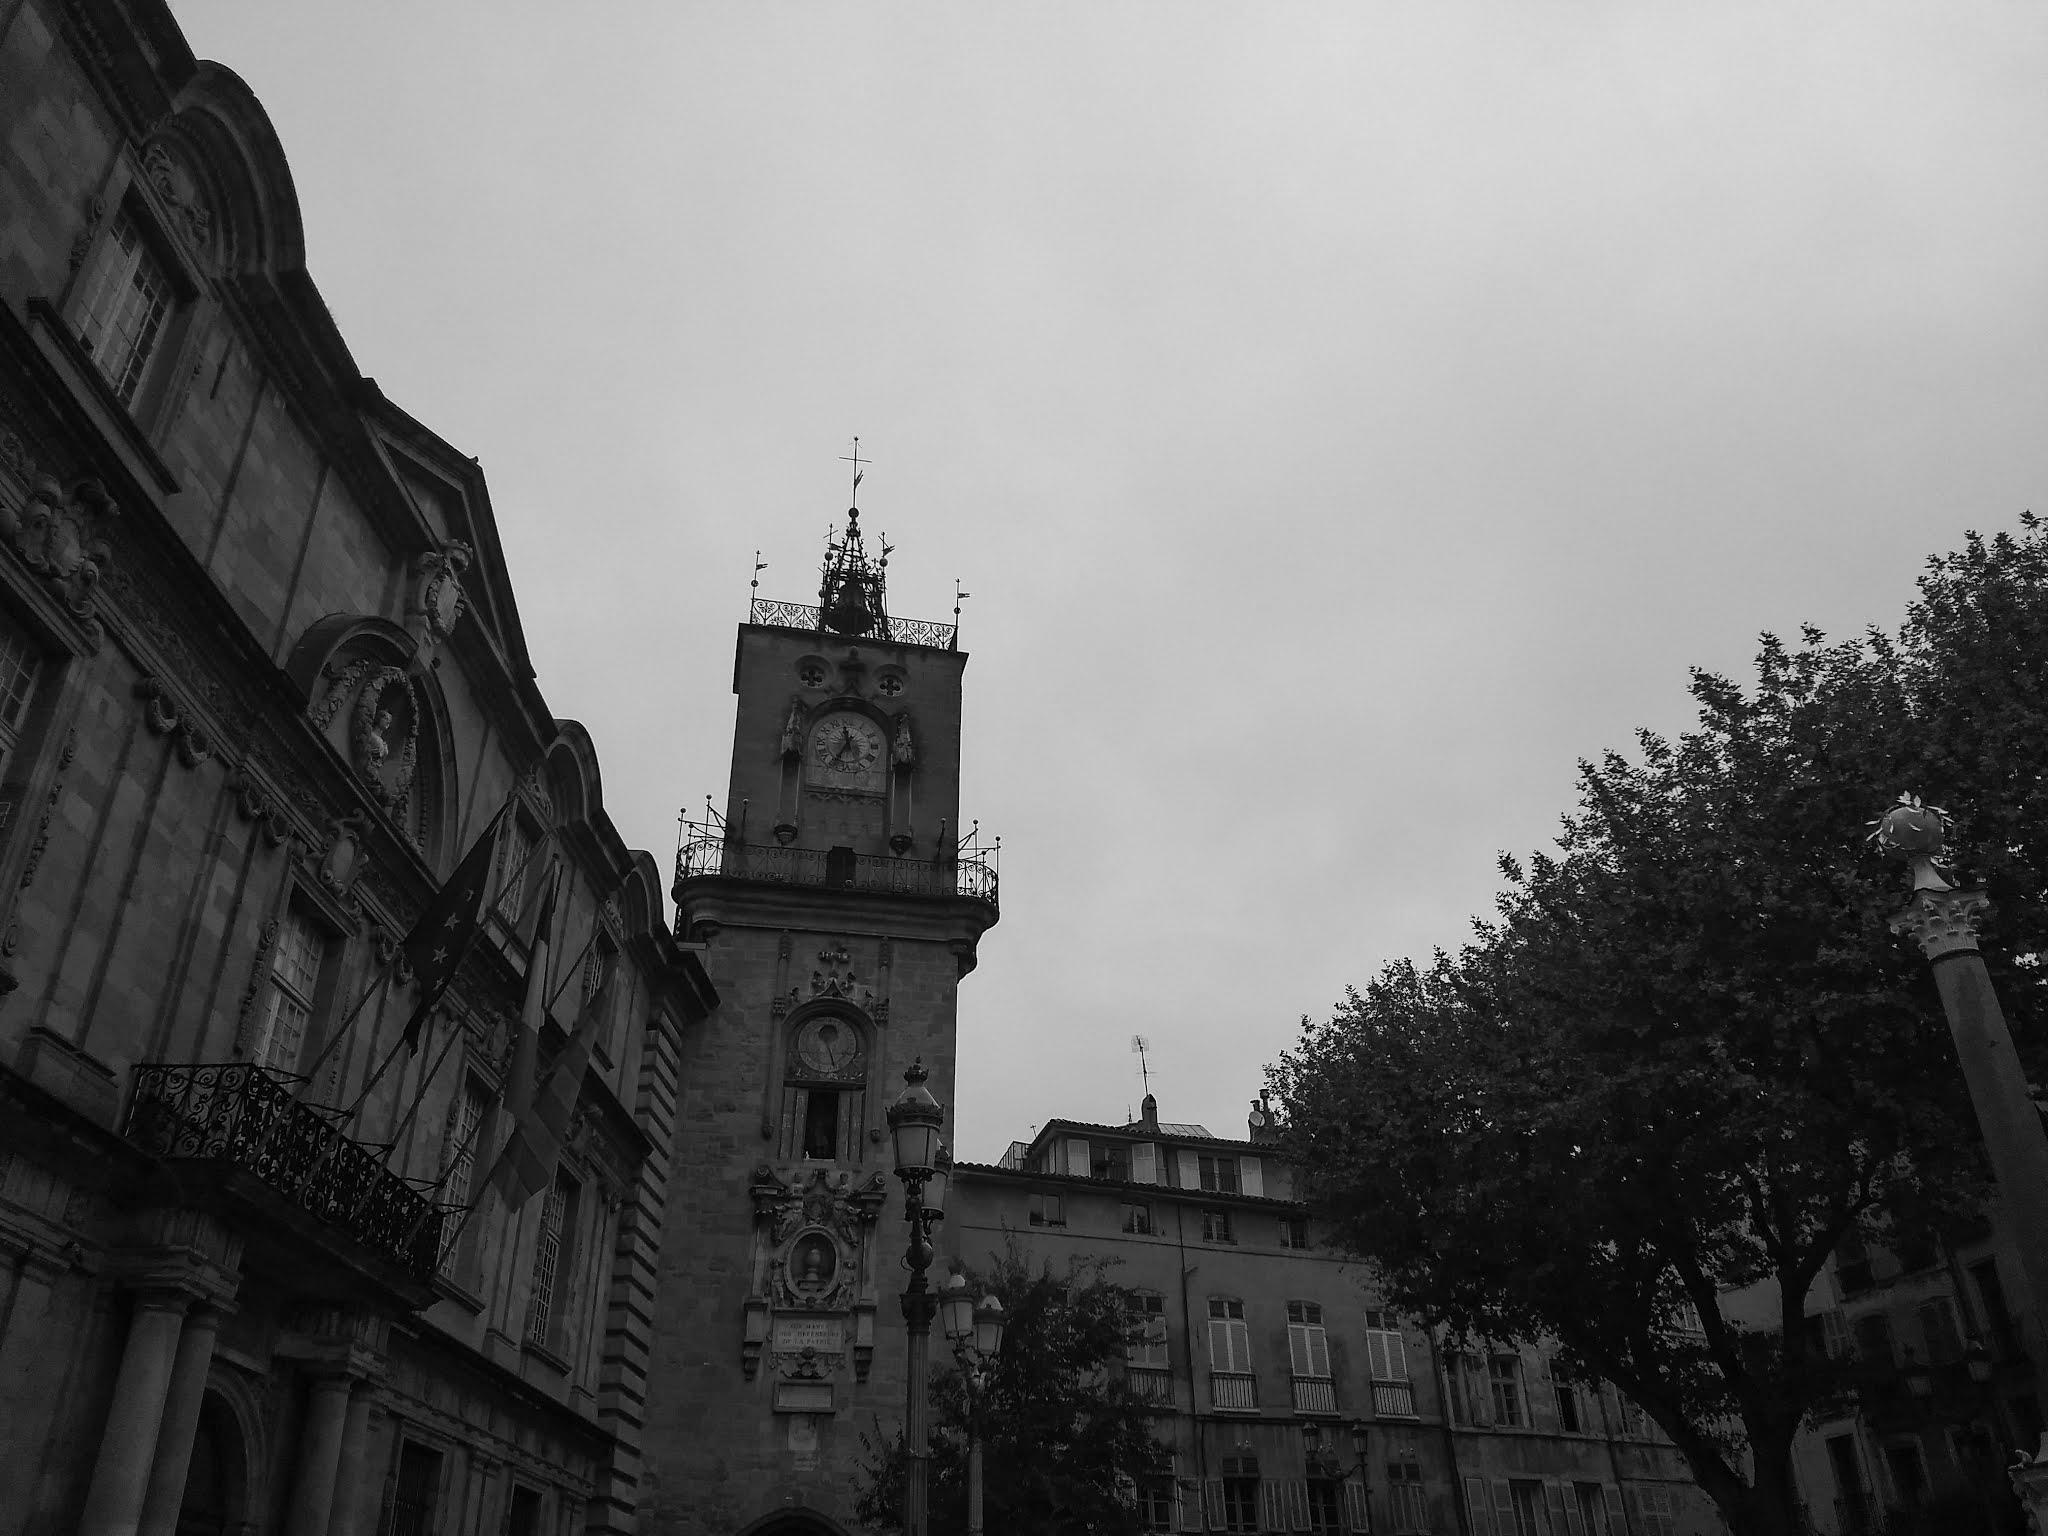 The belfry at Place de l'Hotel de Ville next to the Town Hall in Aix-en-Provence.